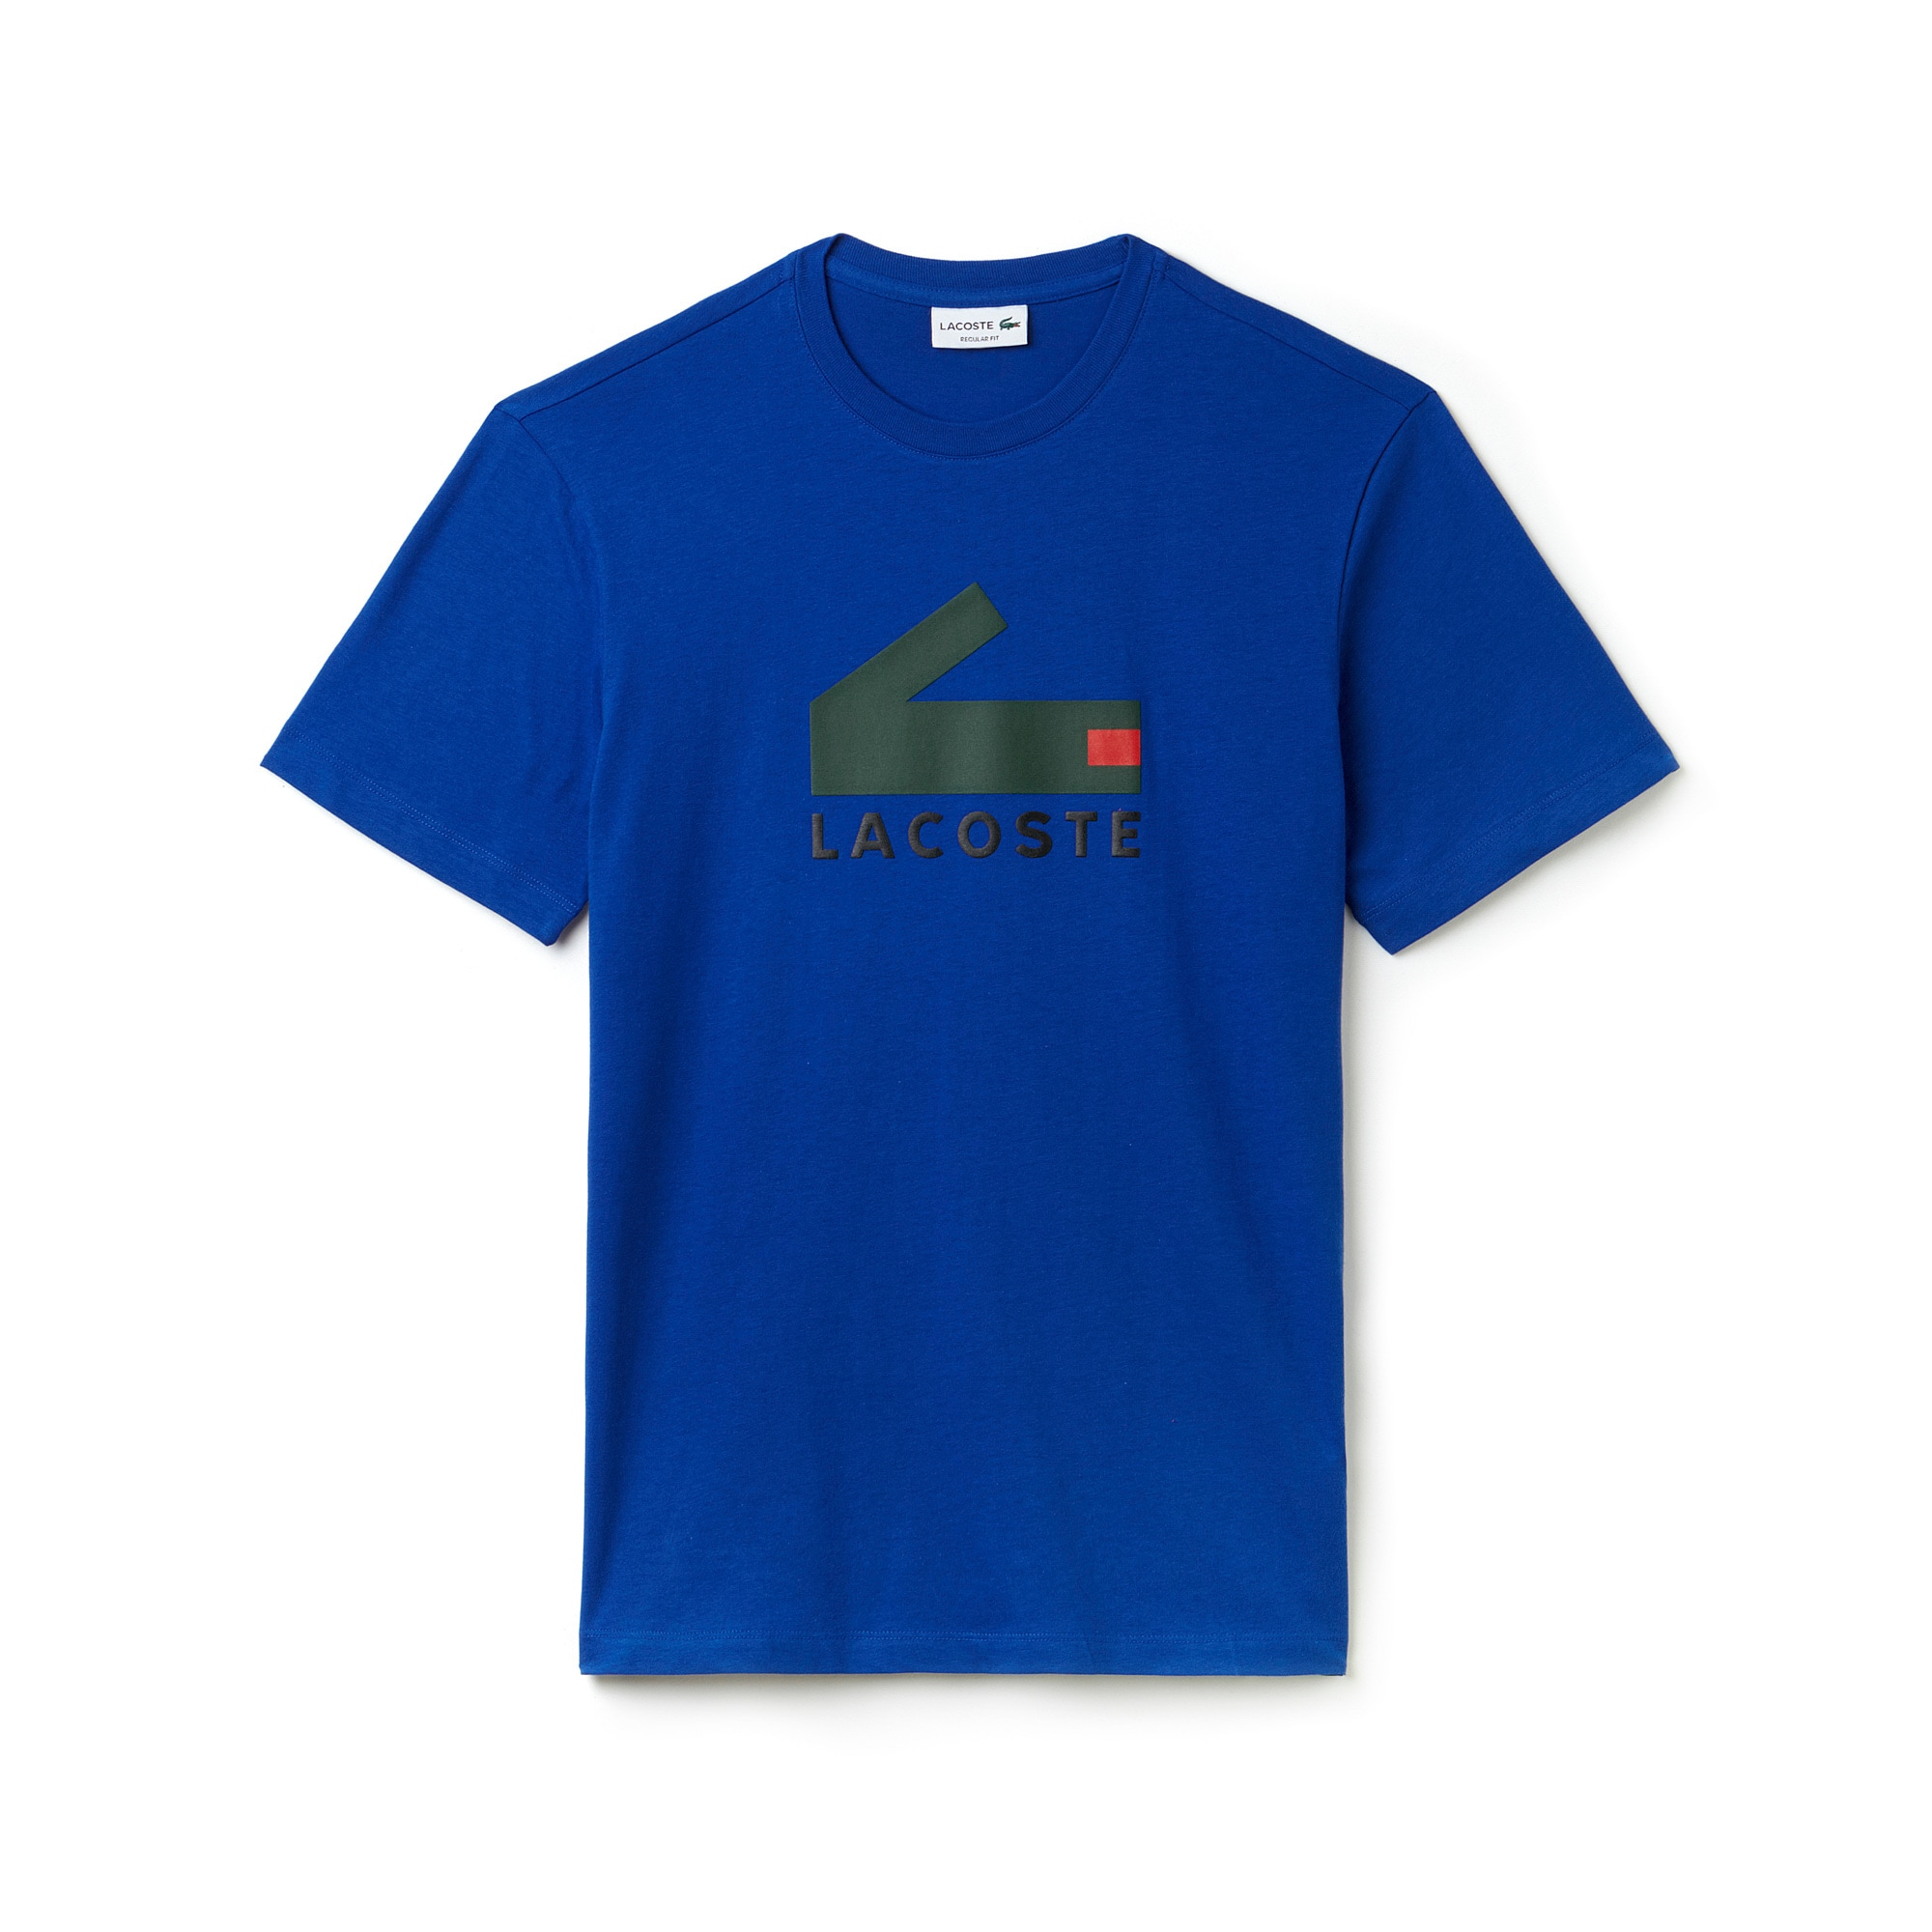 Men's Crew Neck Graphic Crocodile Branding Cotton Jersey T-shirt